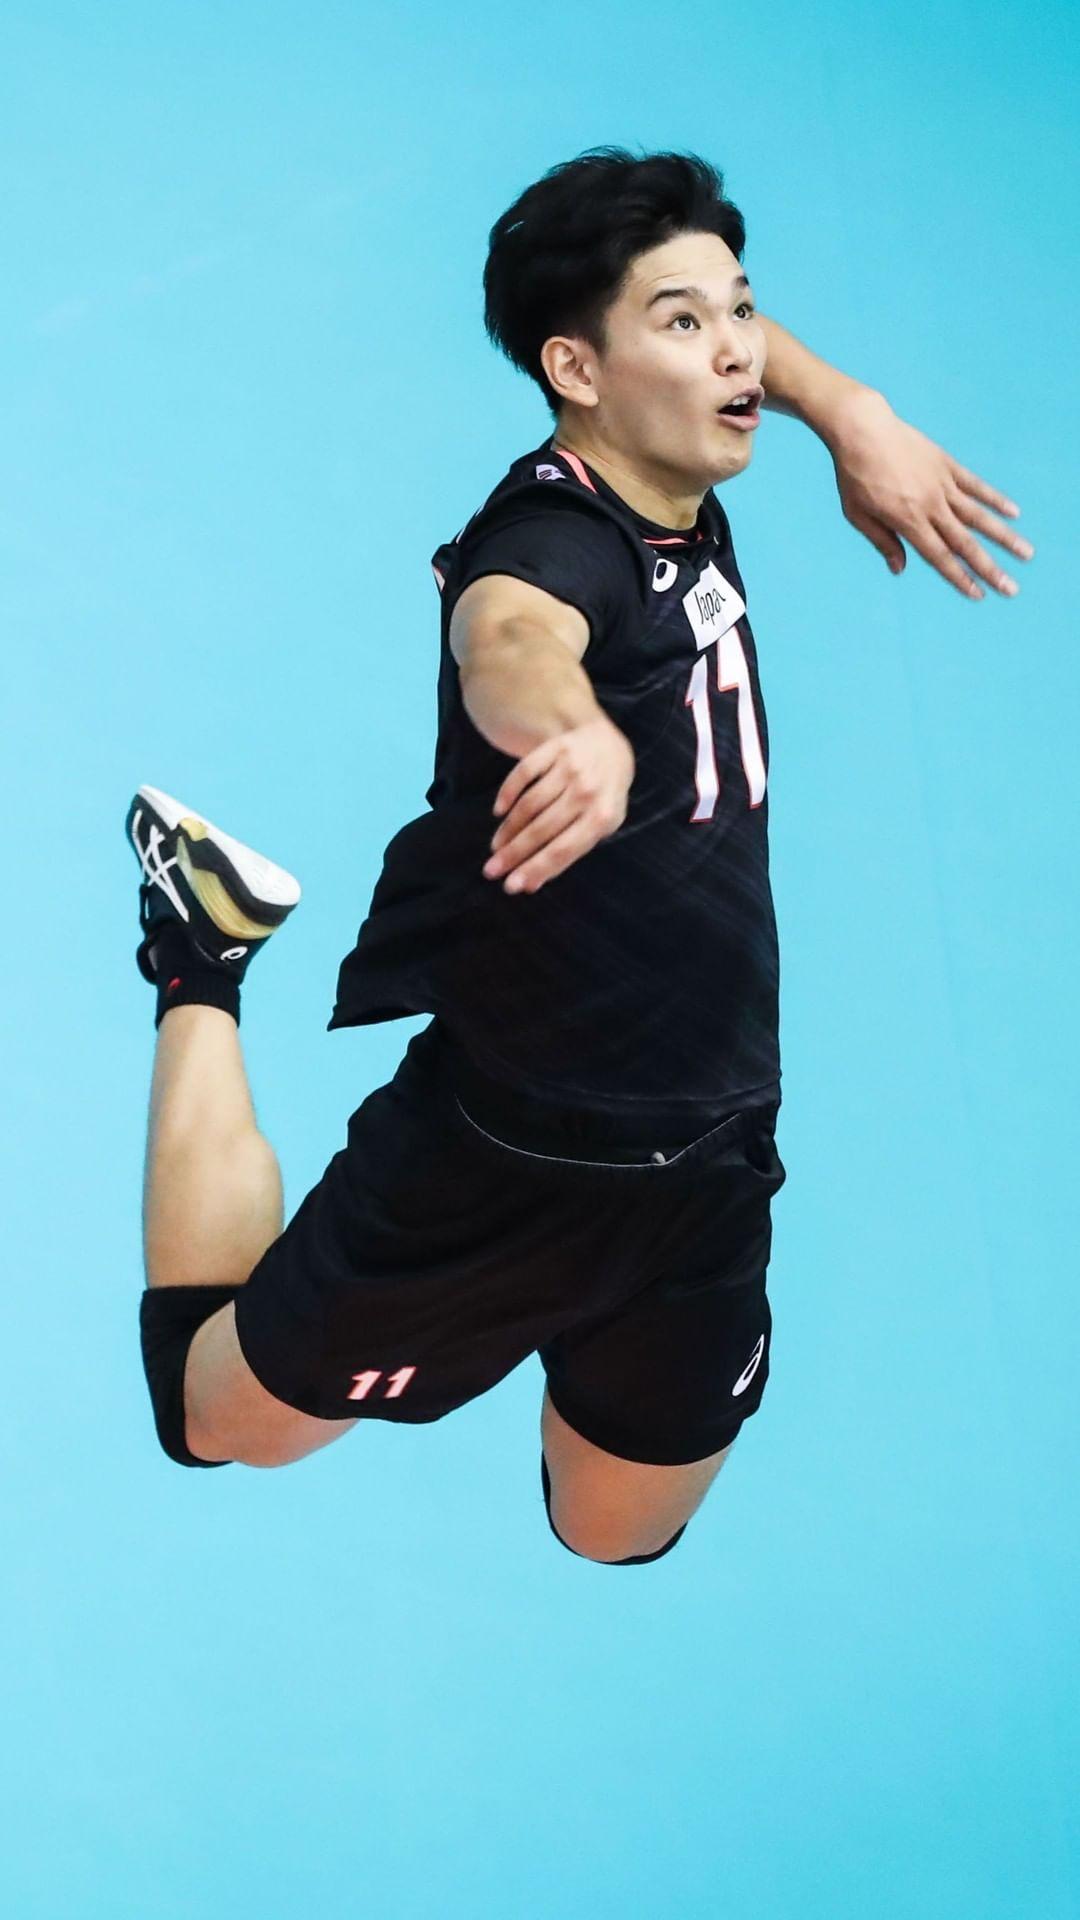 Pin Oleh Janith Kaveesha Di Volleyball Di 2020